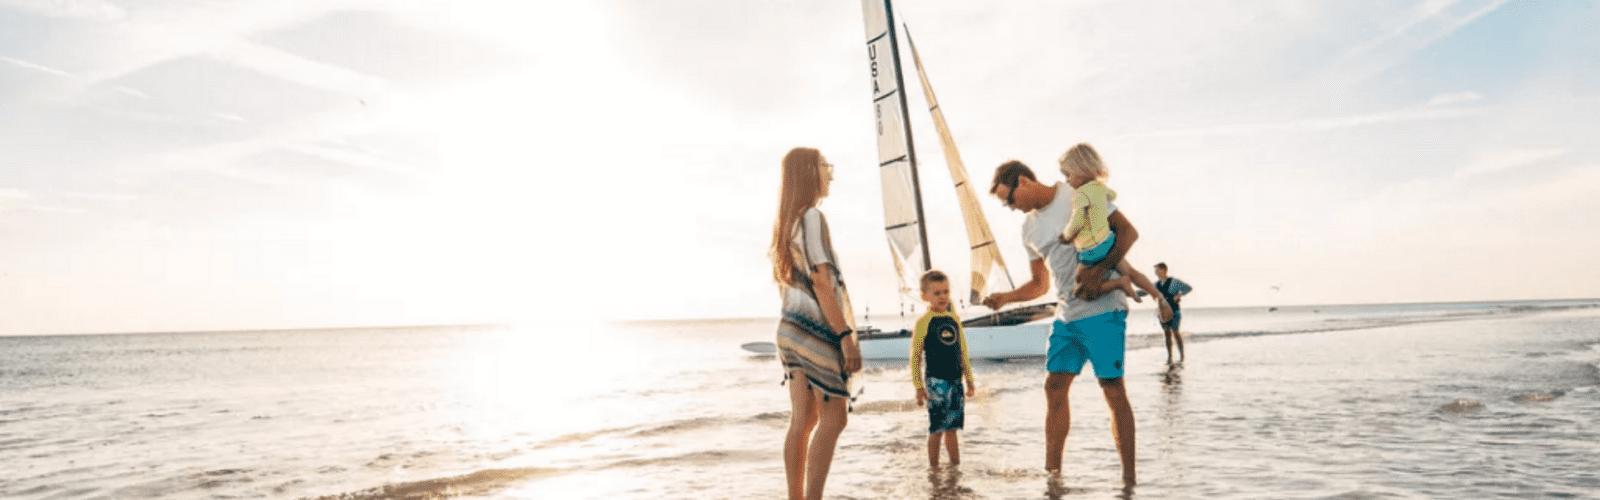 Sarasota Boating, water activities